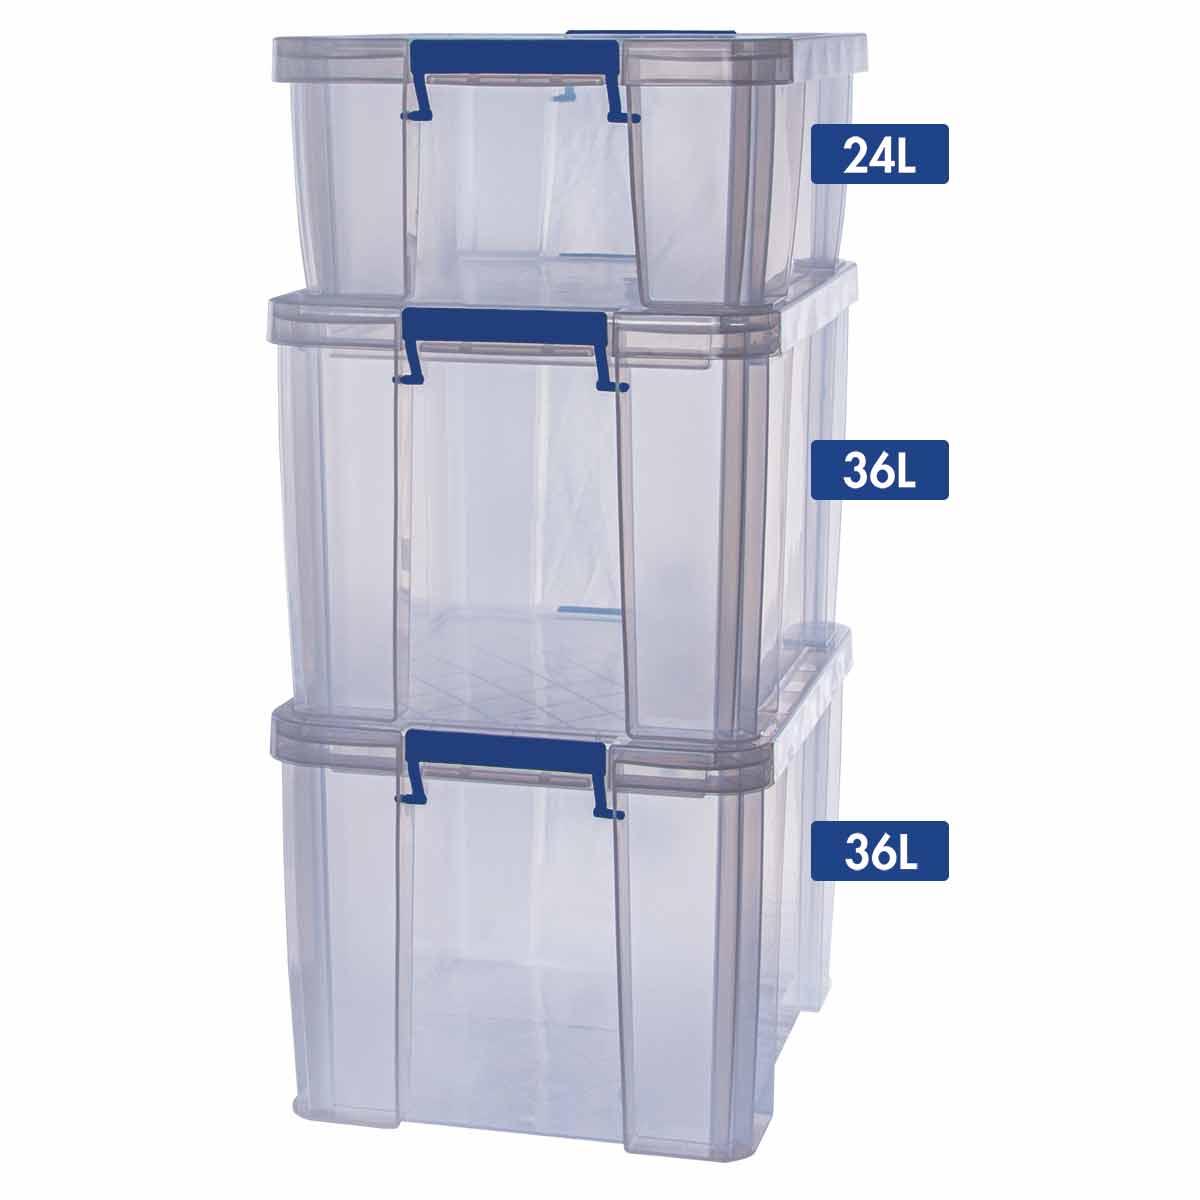 Image of ProStore Storage Box Bonus Pack 3 96L Capacity, Clear